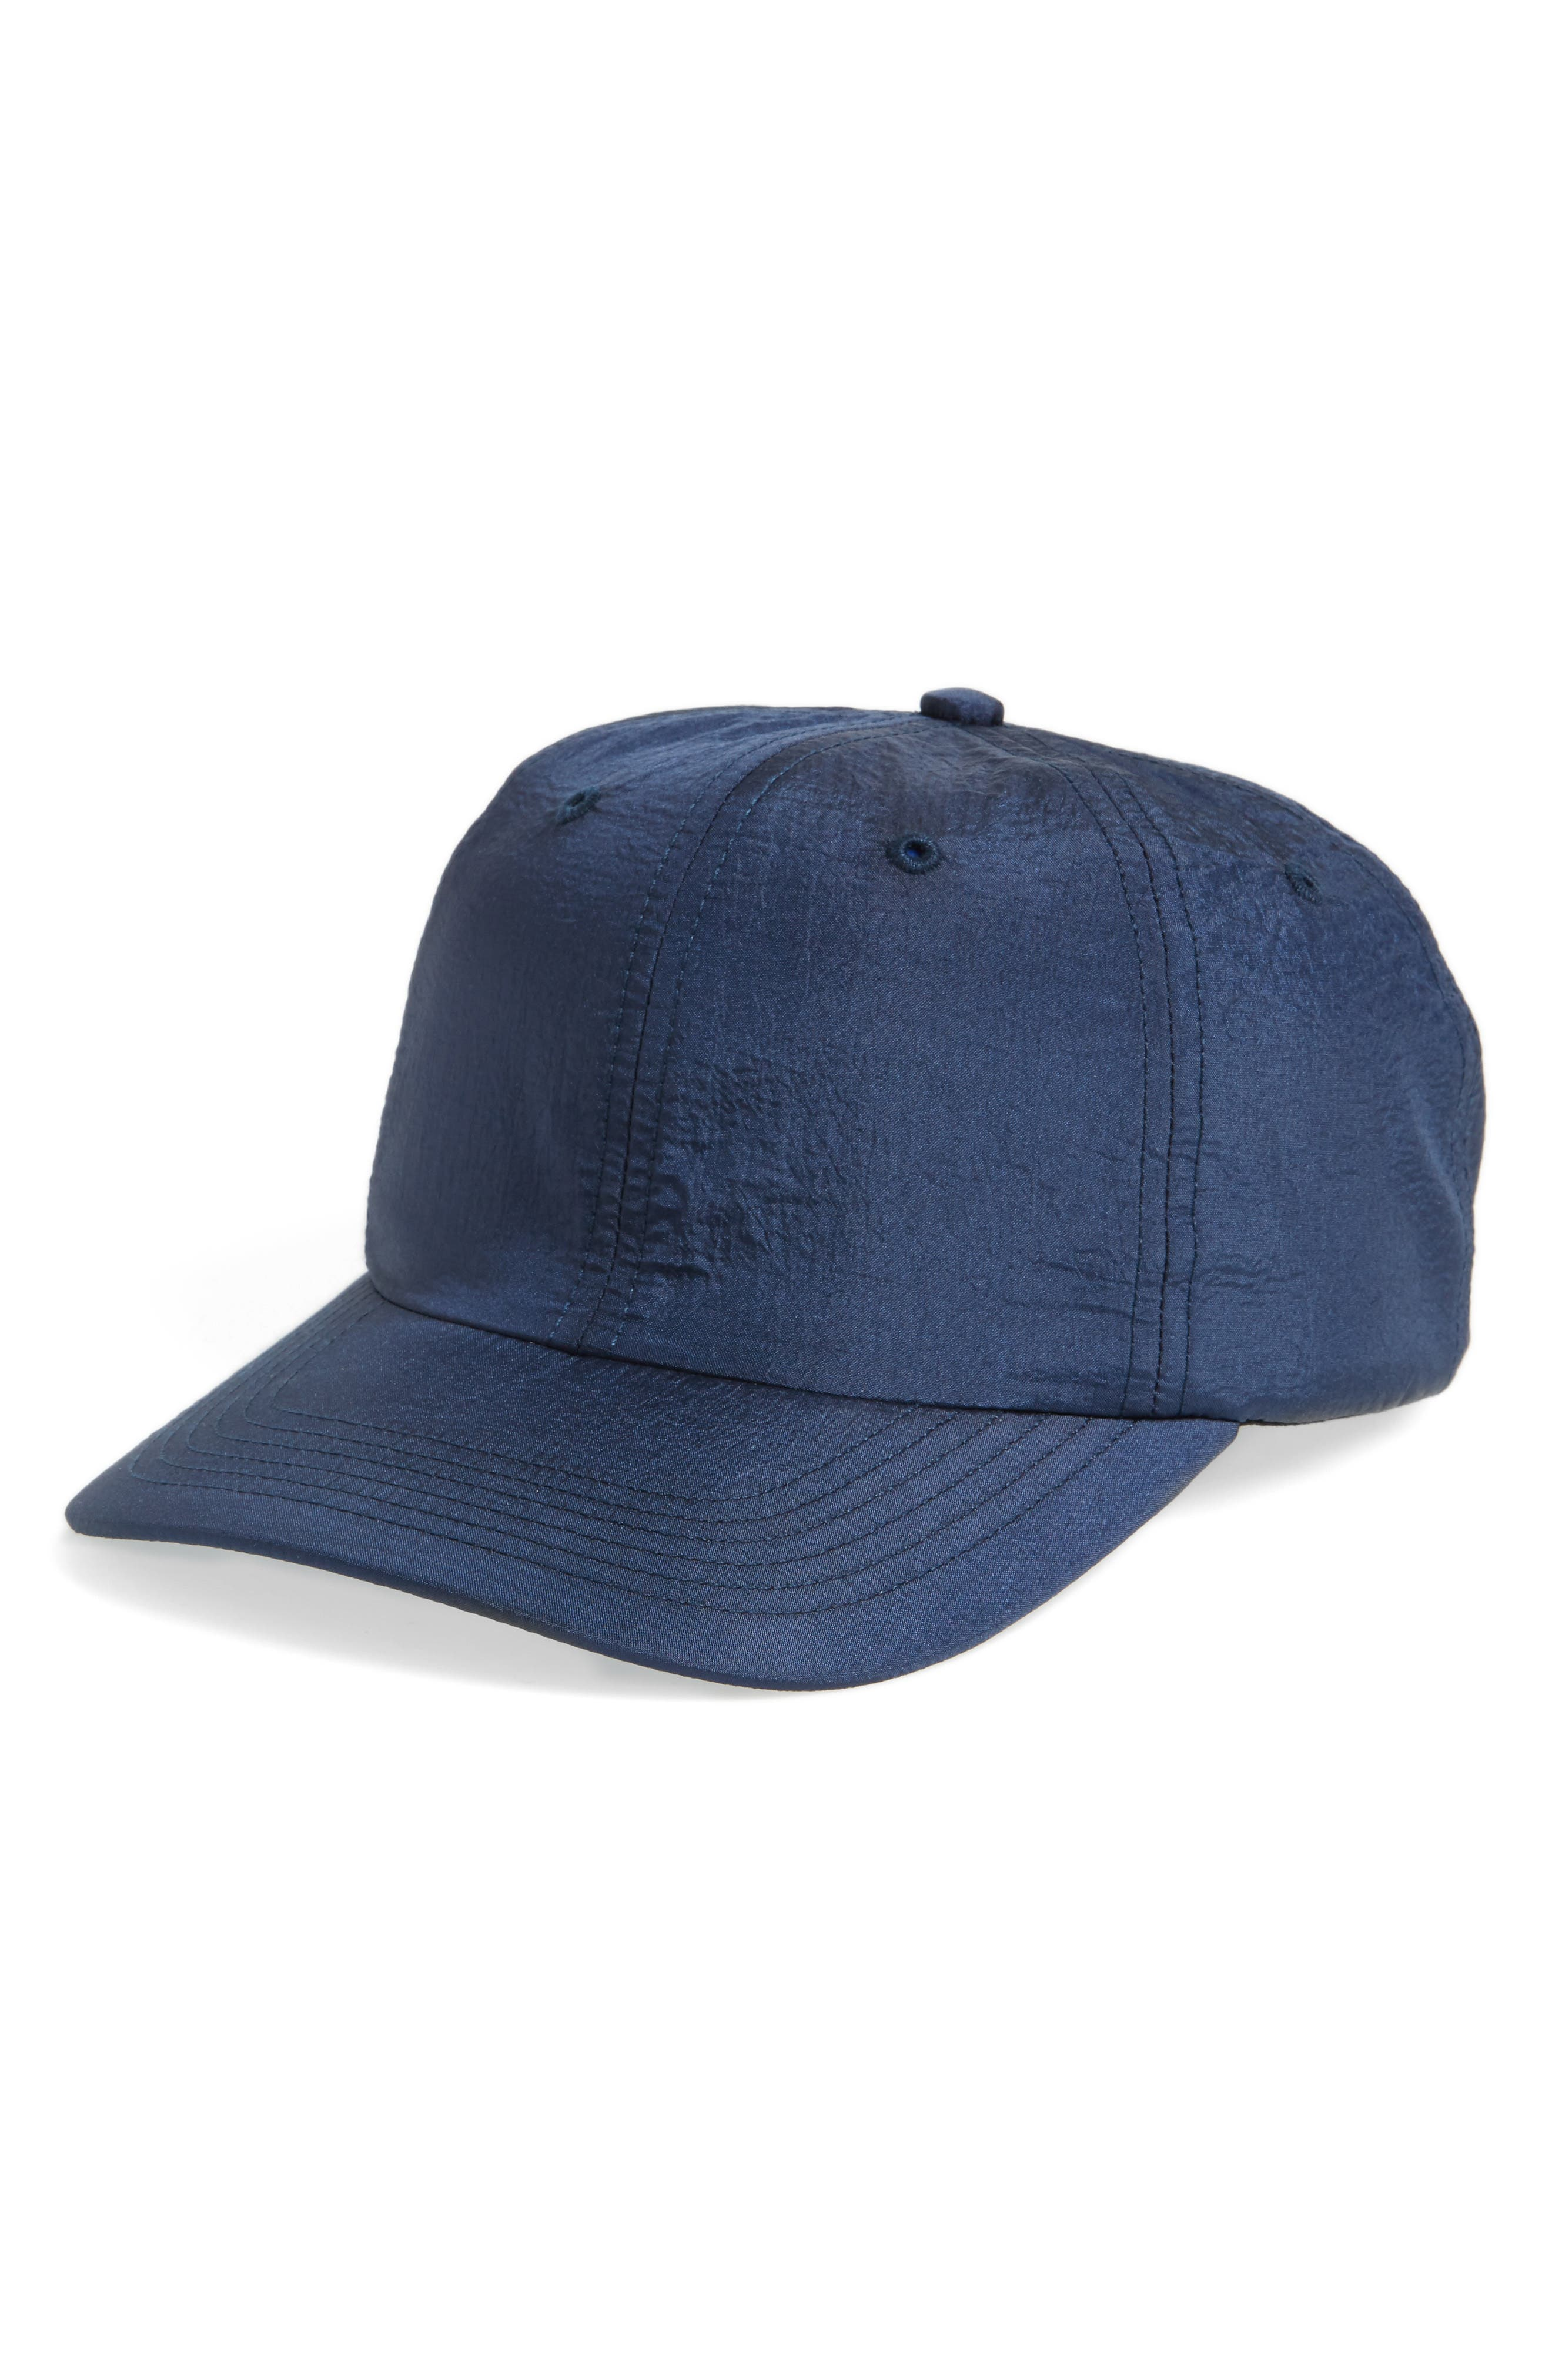 Nylon Ball Cap,                         Main,                         color, 410